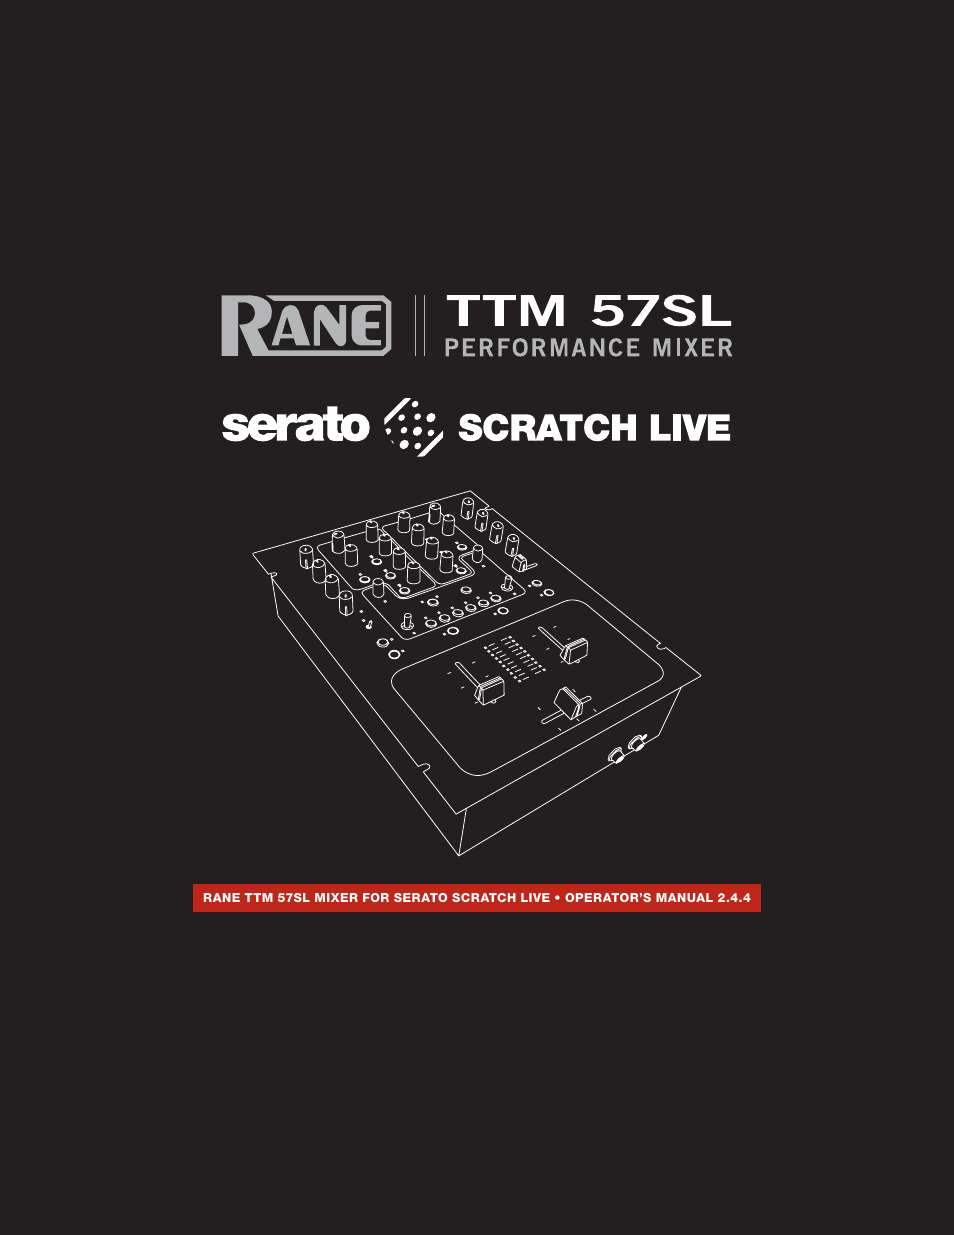 rane ttm 57sl manual for serato scratch live 2 44 user manual 60 pages rh manualsdir com serato scratch live sl1 manual serato scratch live 2.5 manual